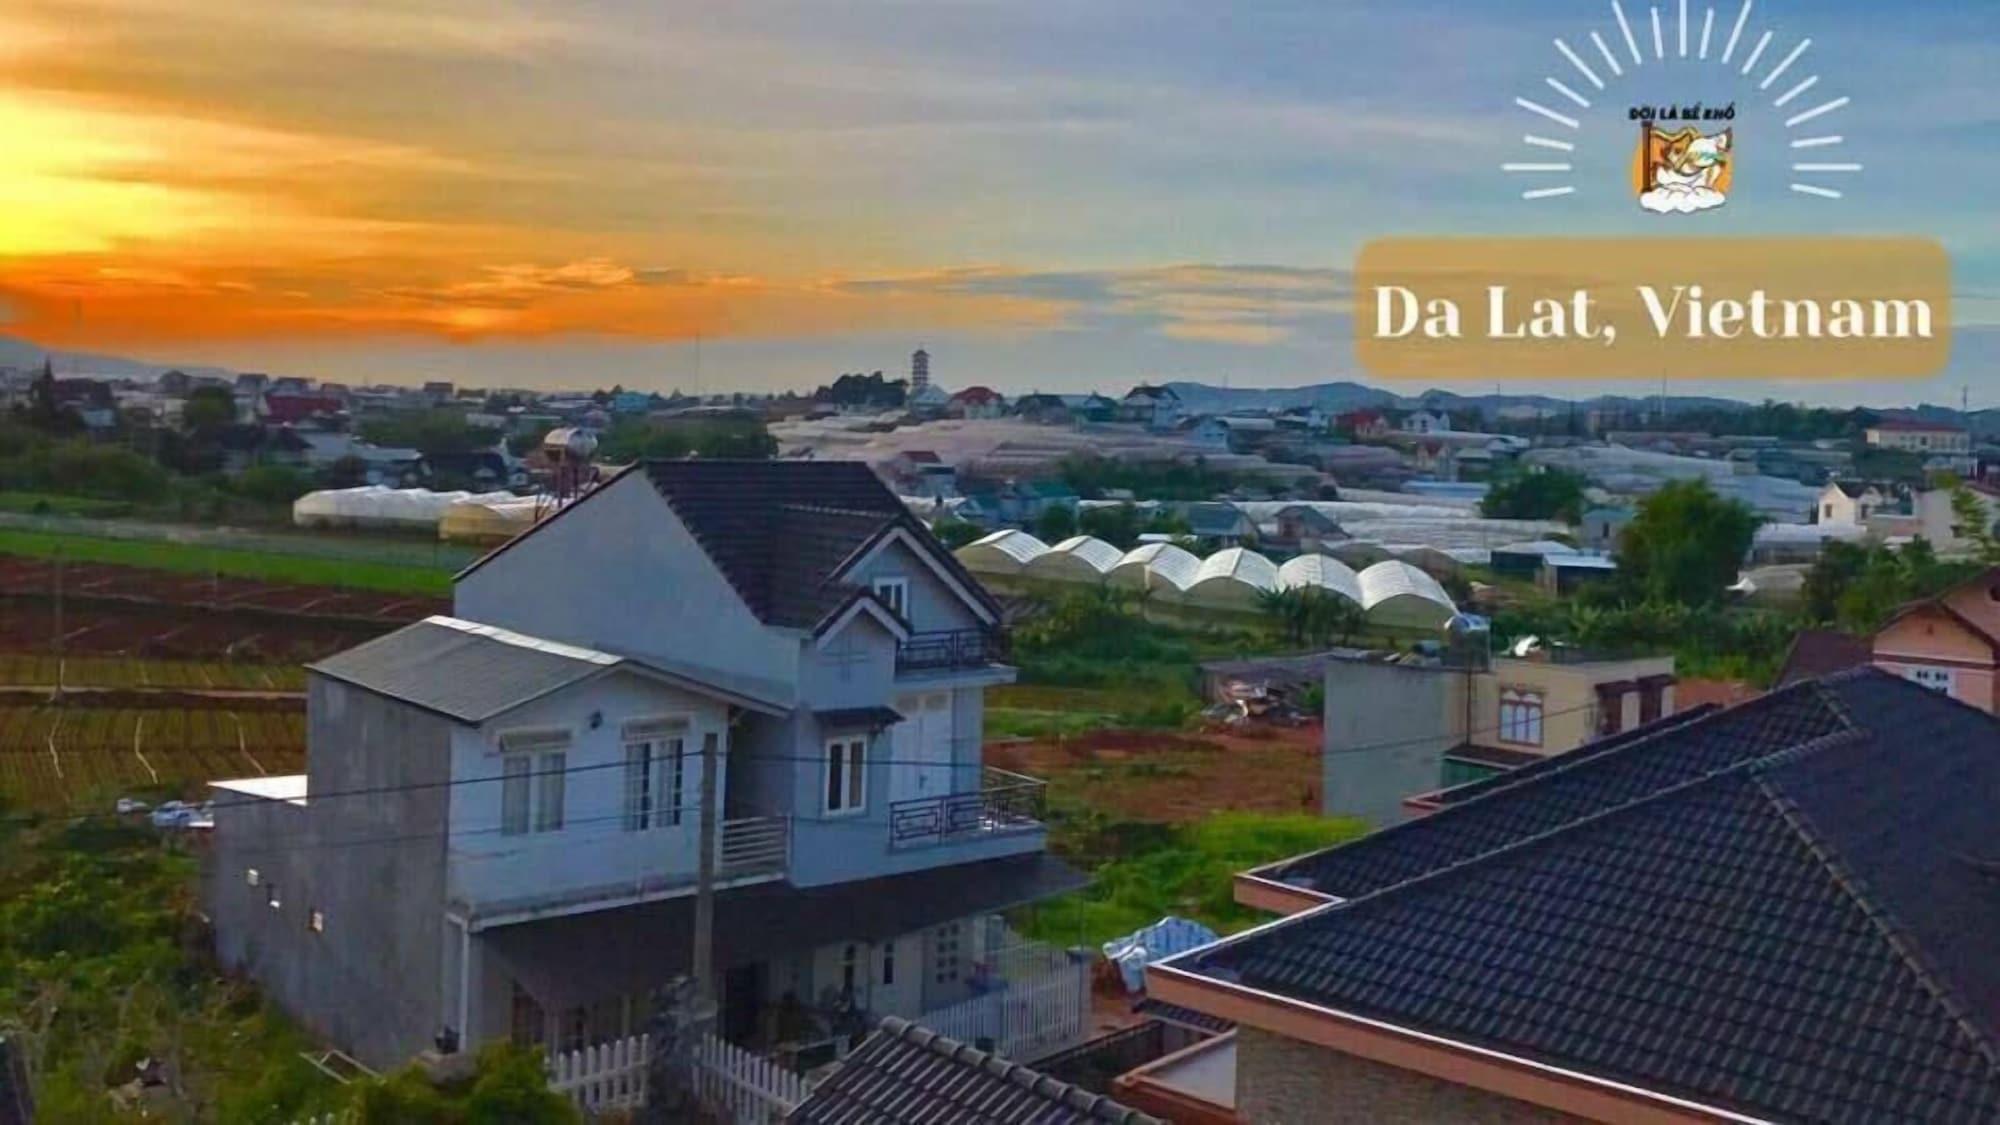 Anada Serviced Apartments In Dalat, Đà Lạt